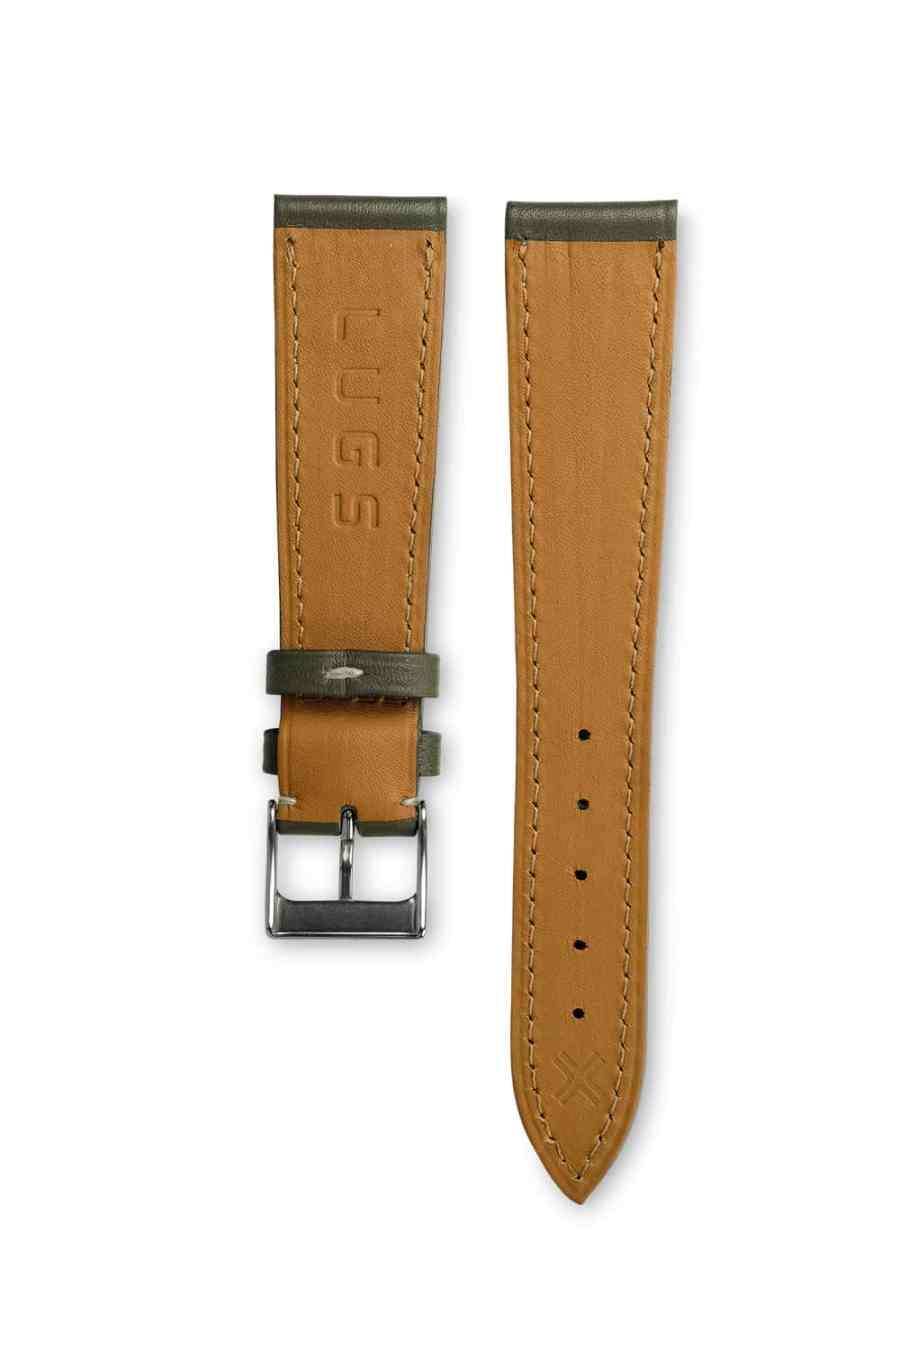 Smooth Classic Khaki green leather watch strap - cream stitching - LUGS brand